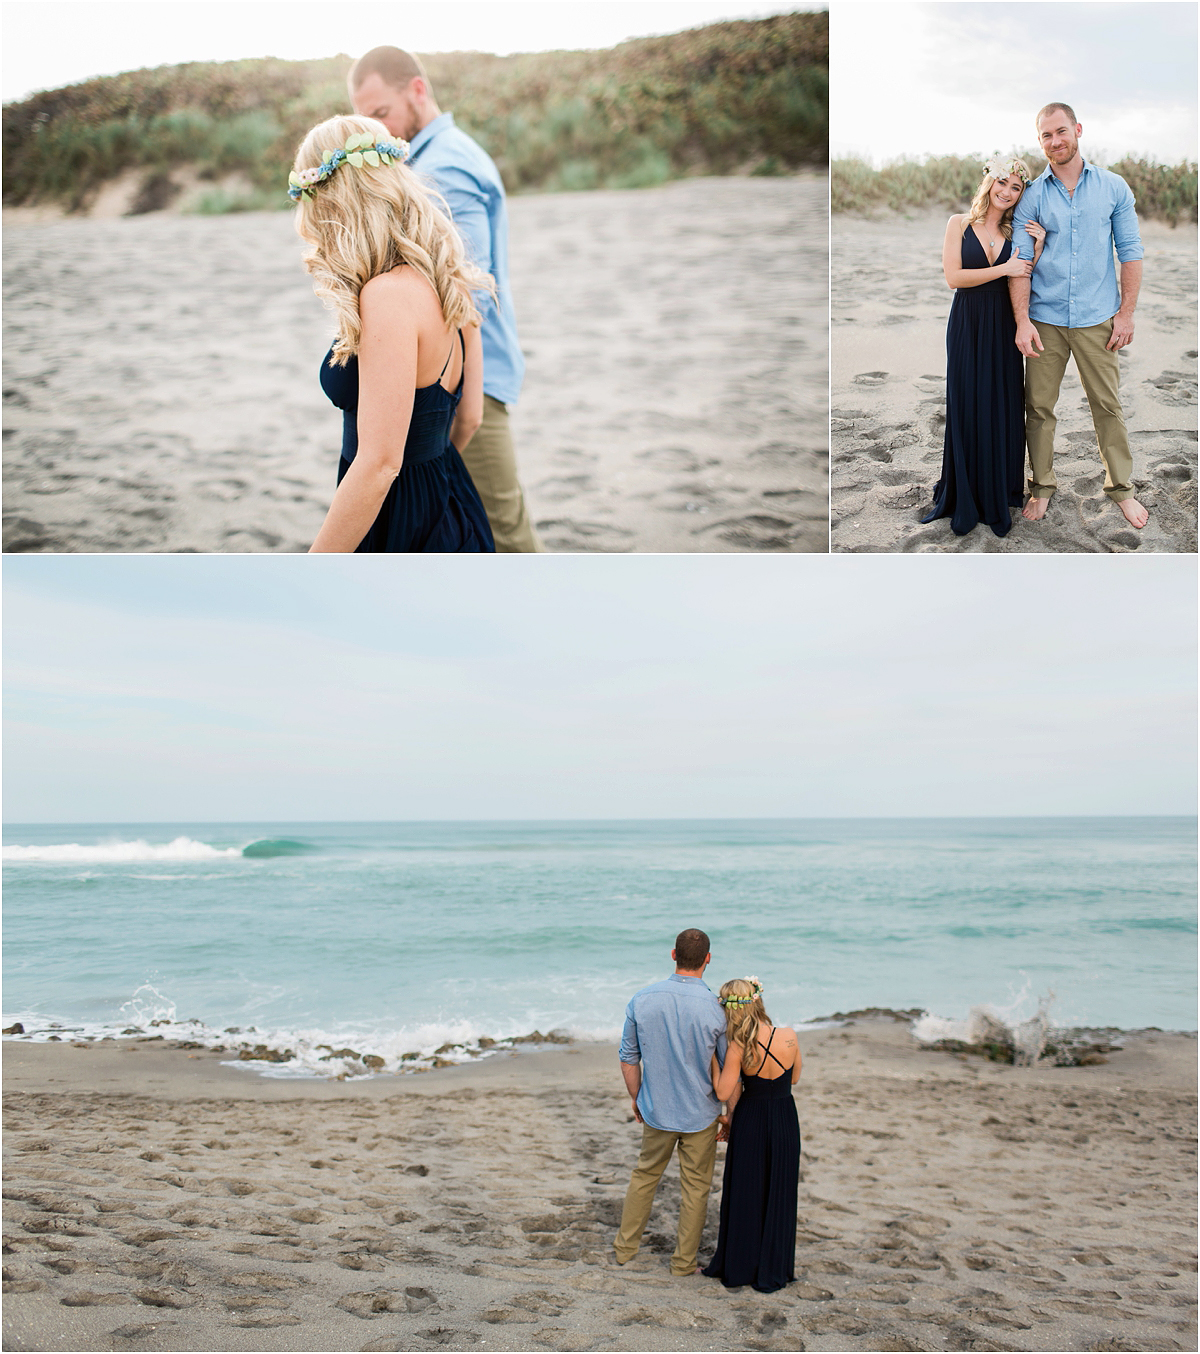 Jupiter-Beach-engagement-photography_0008